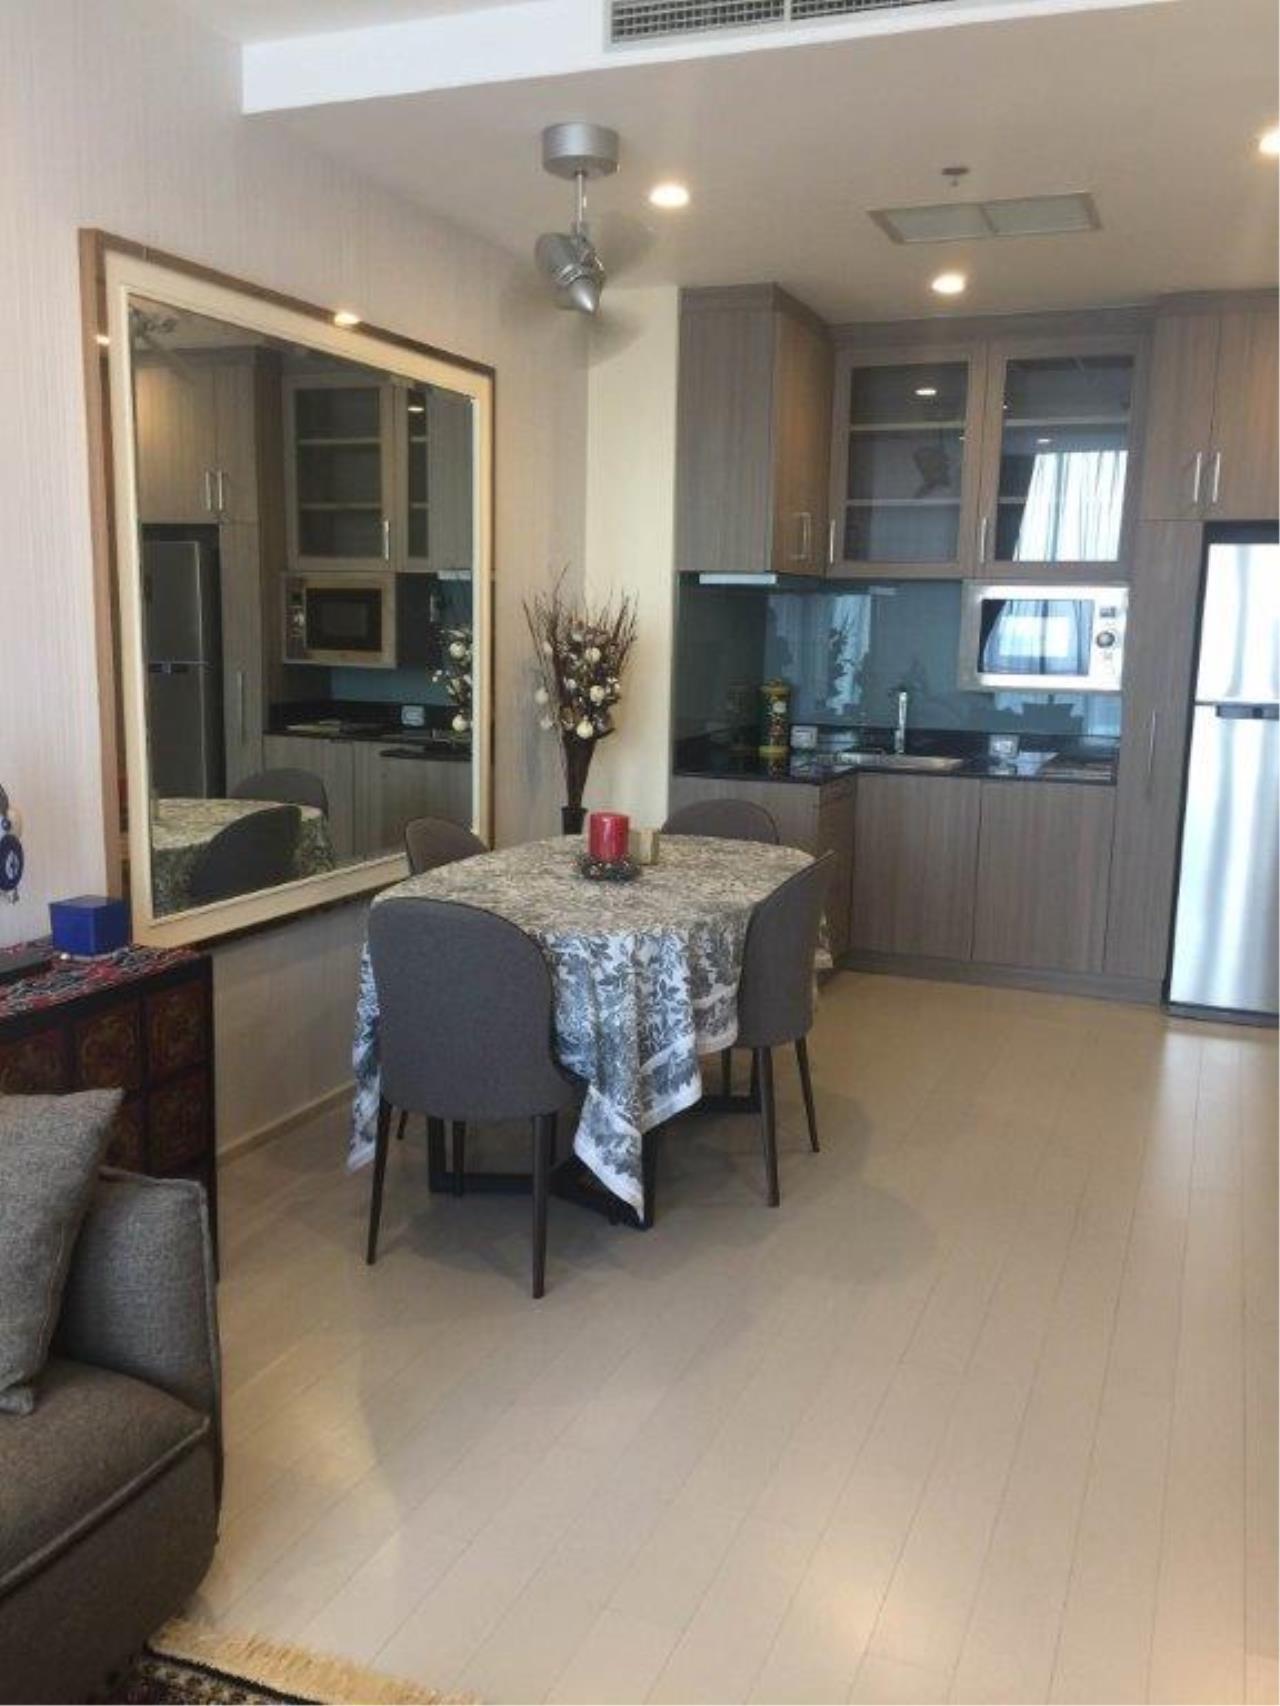 Century21 Skylux Agency's Noble Ploenchit / Condo For Rent / 1 Bedroom / 58.9 SQM / BTS Phloen Chit / Bangkok 4